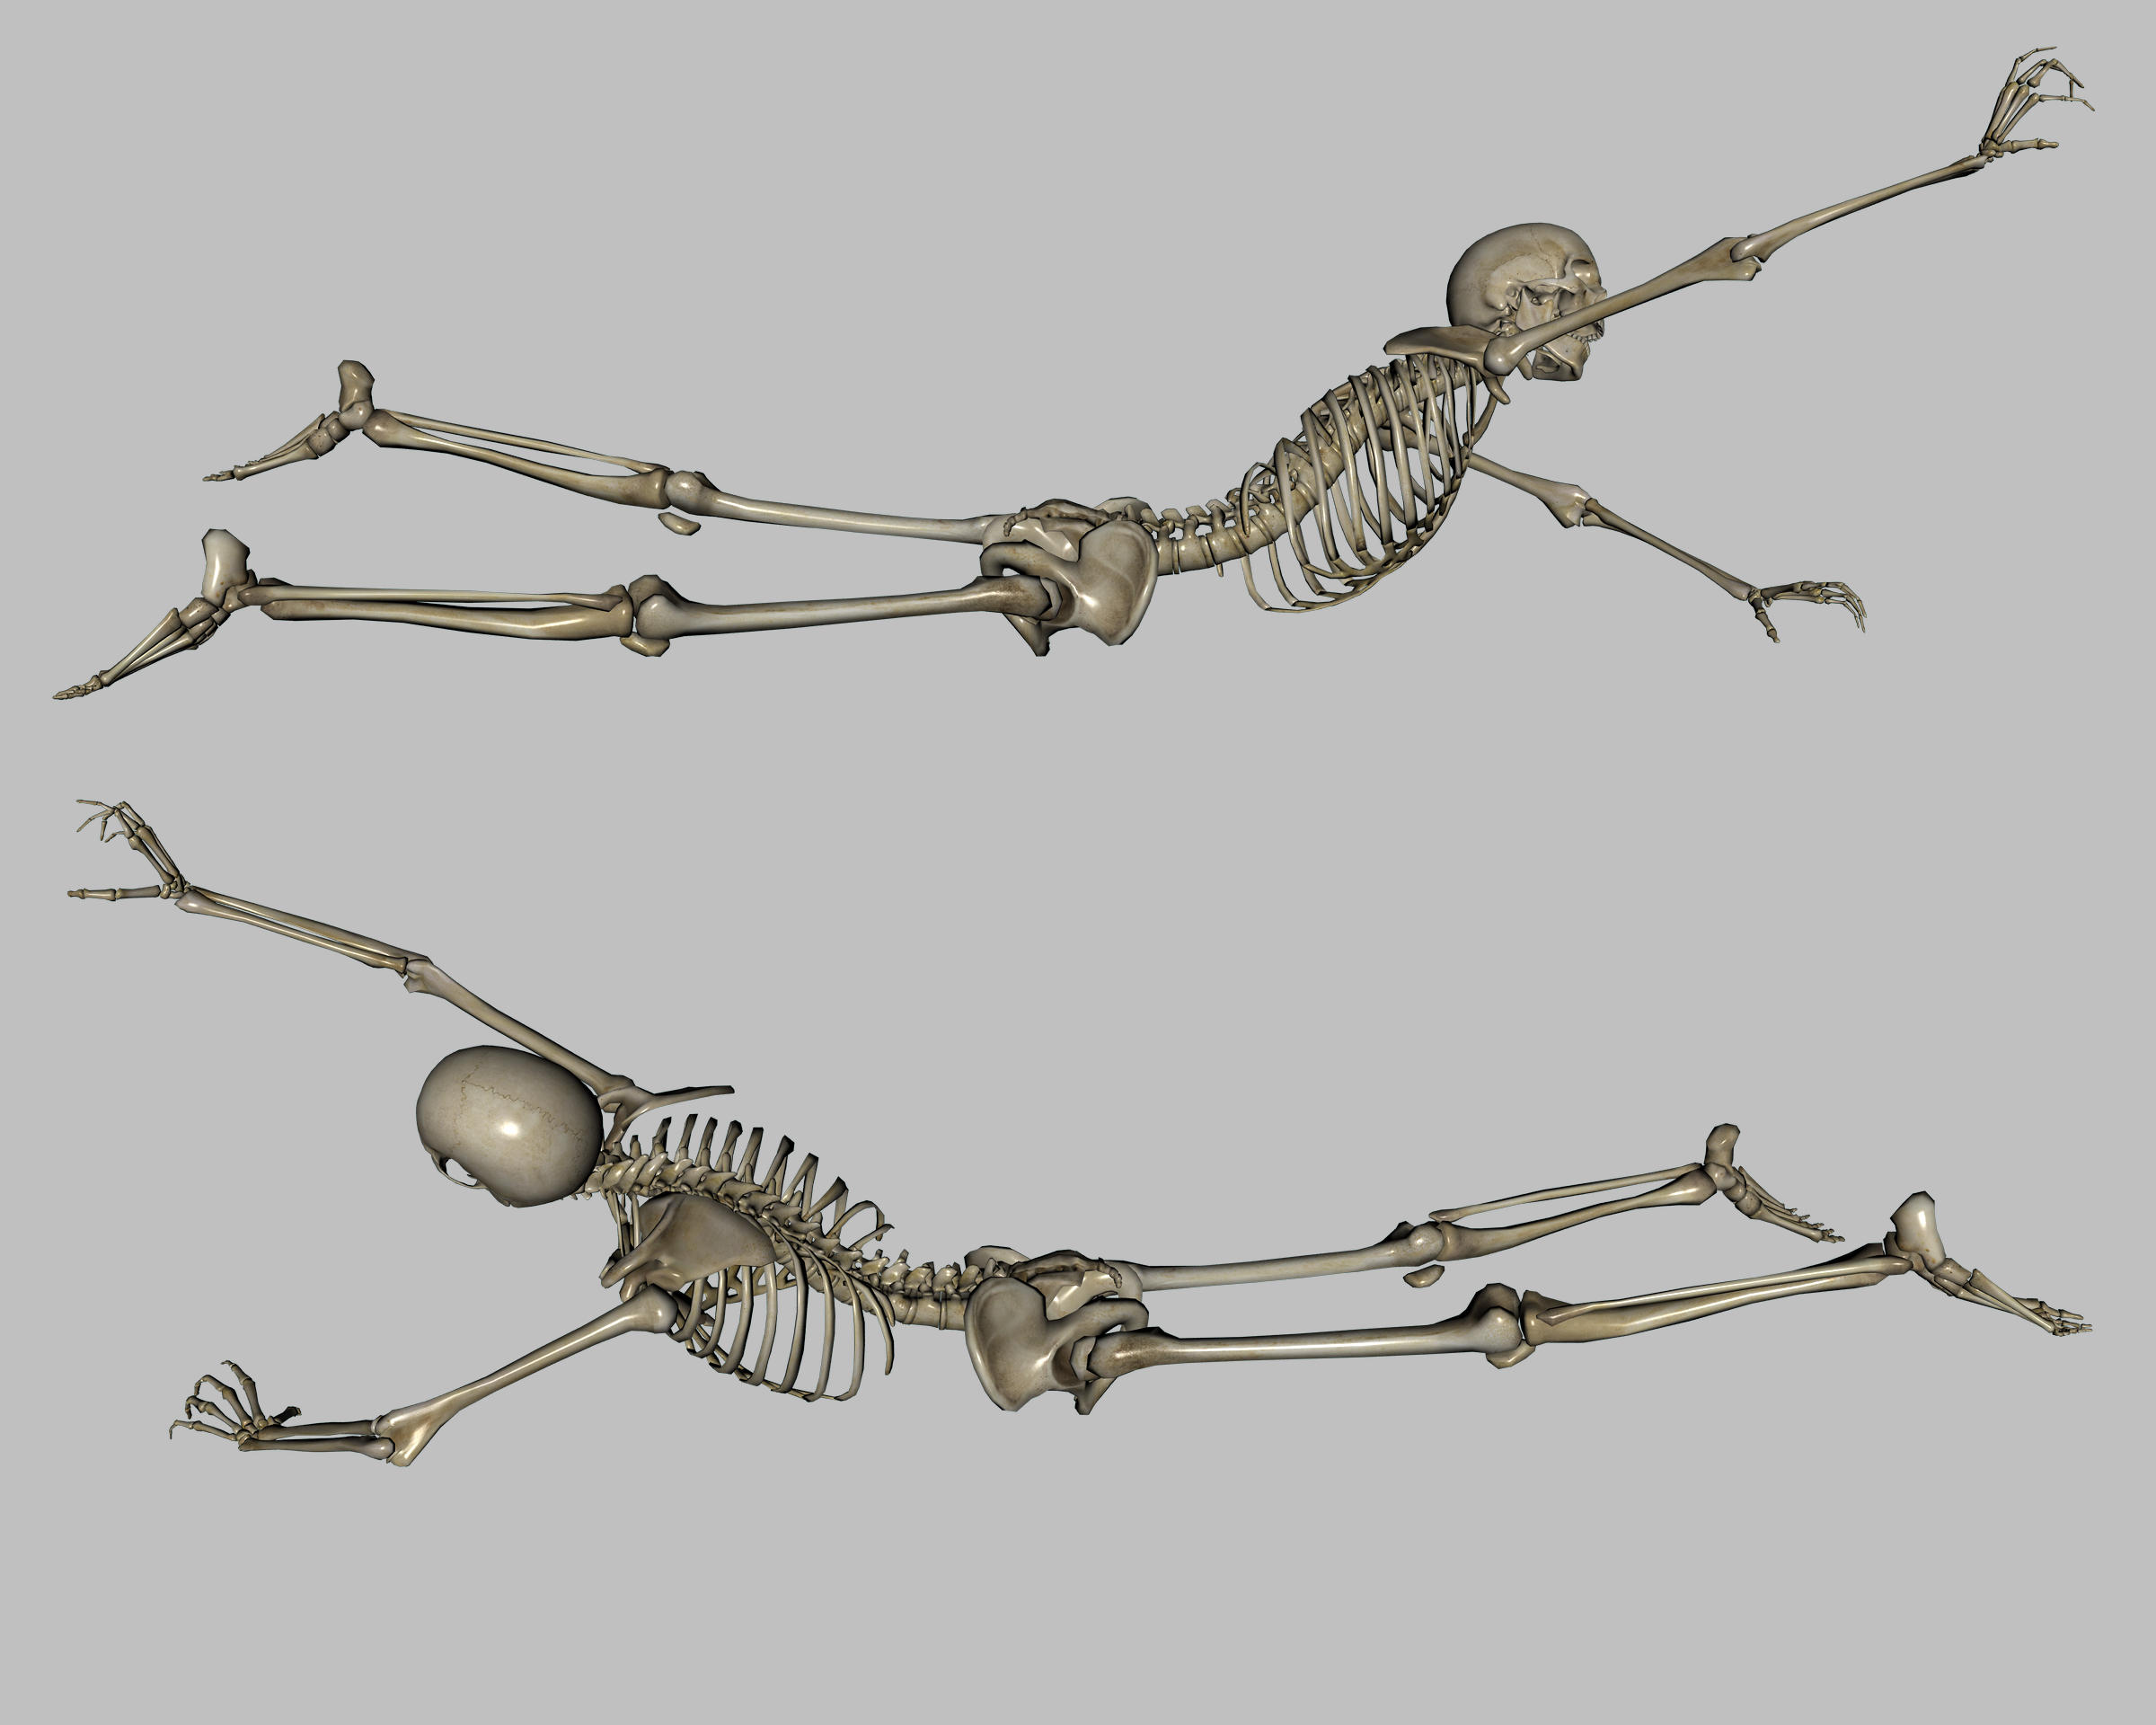 Skeleton - Ground - Side by markopolio-stock